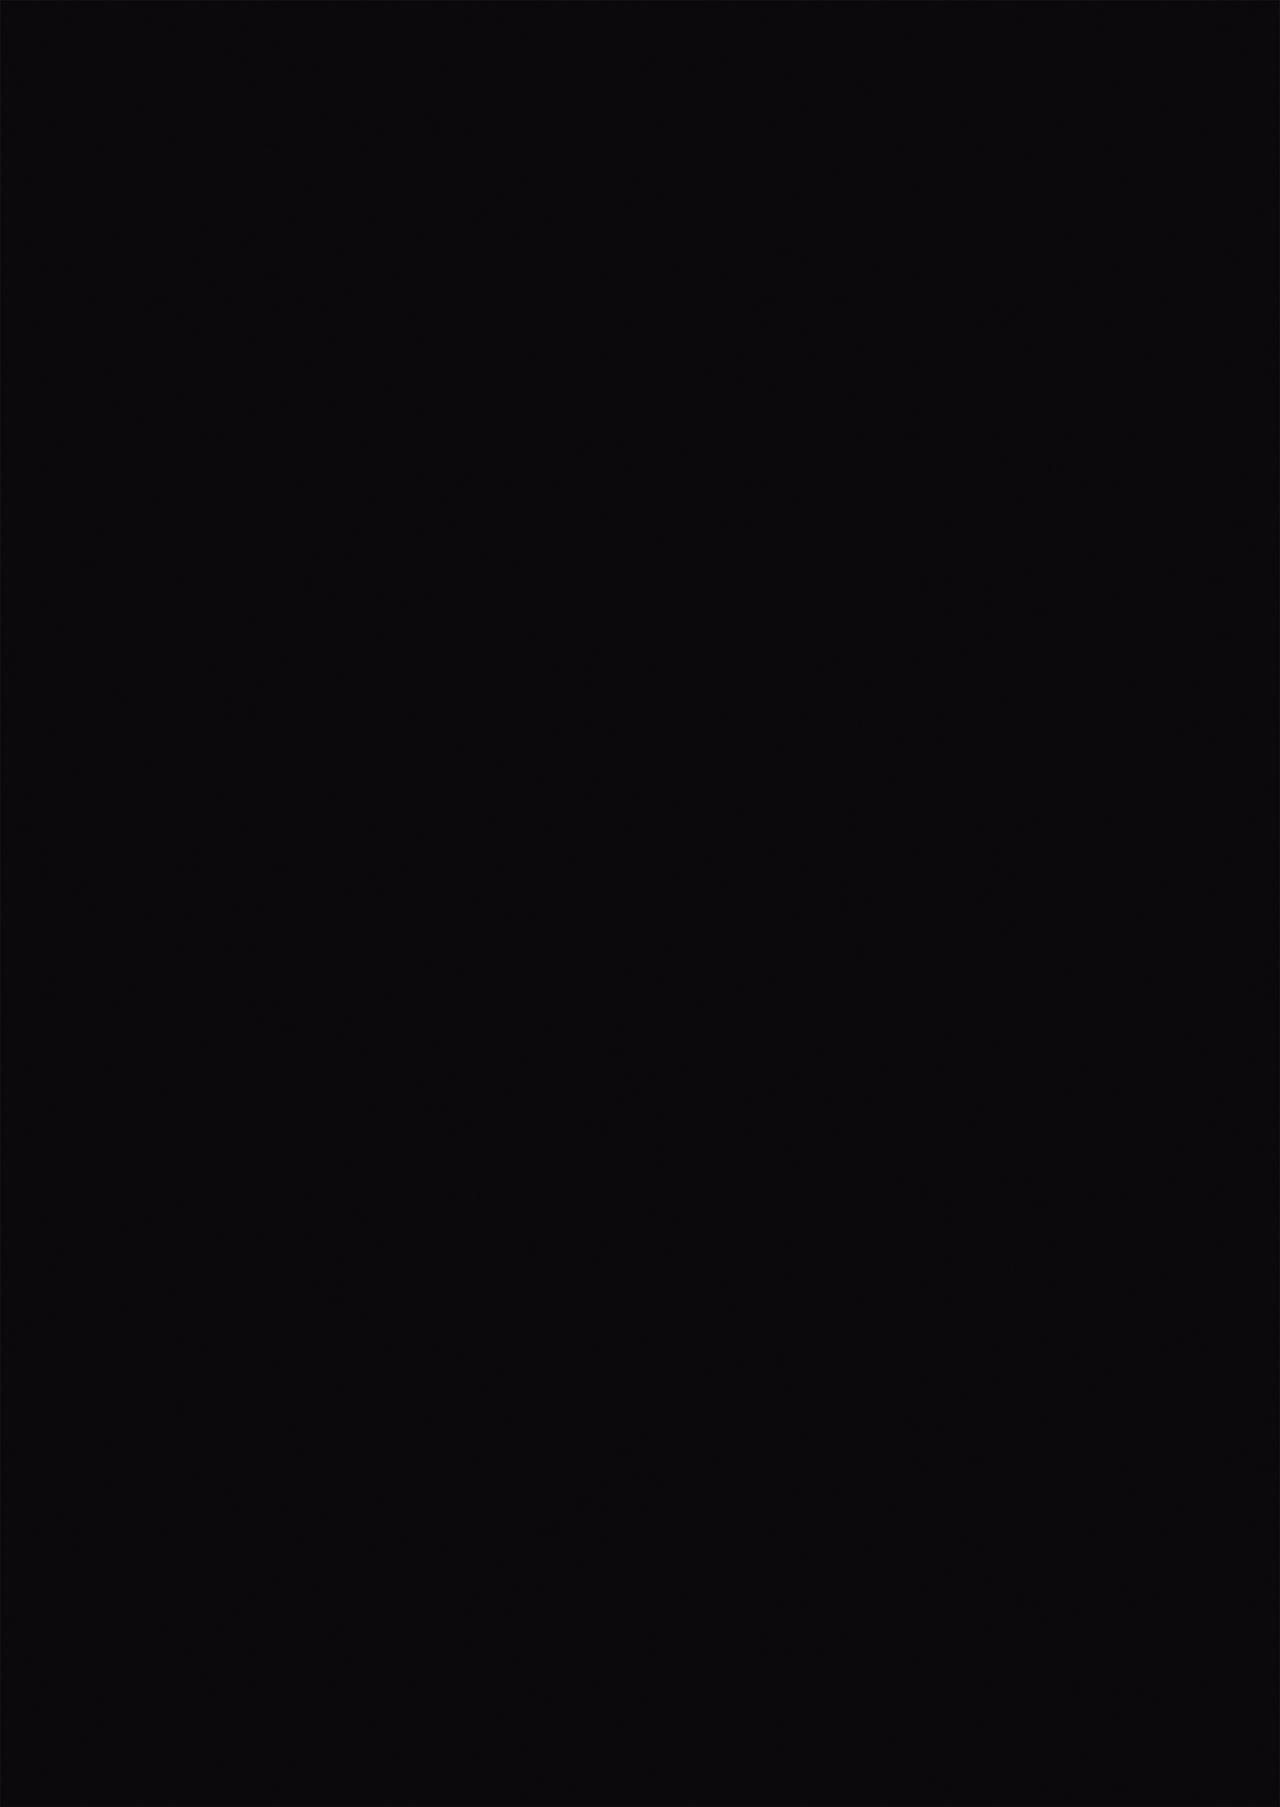 [Remora Works (isaki)] FUTACOLO CO -INHERITANCE- VOL. 004 + Bonus 30